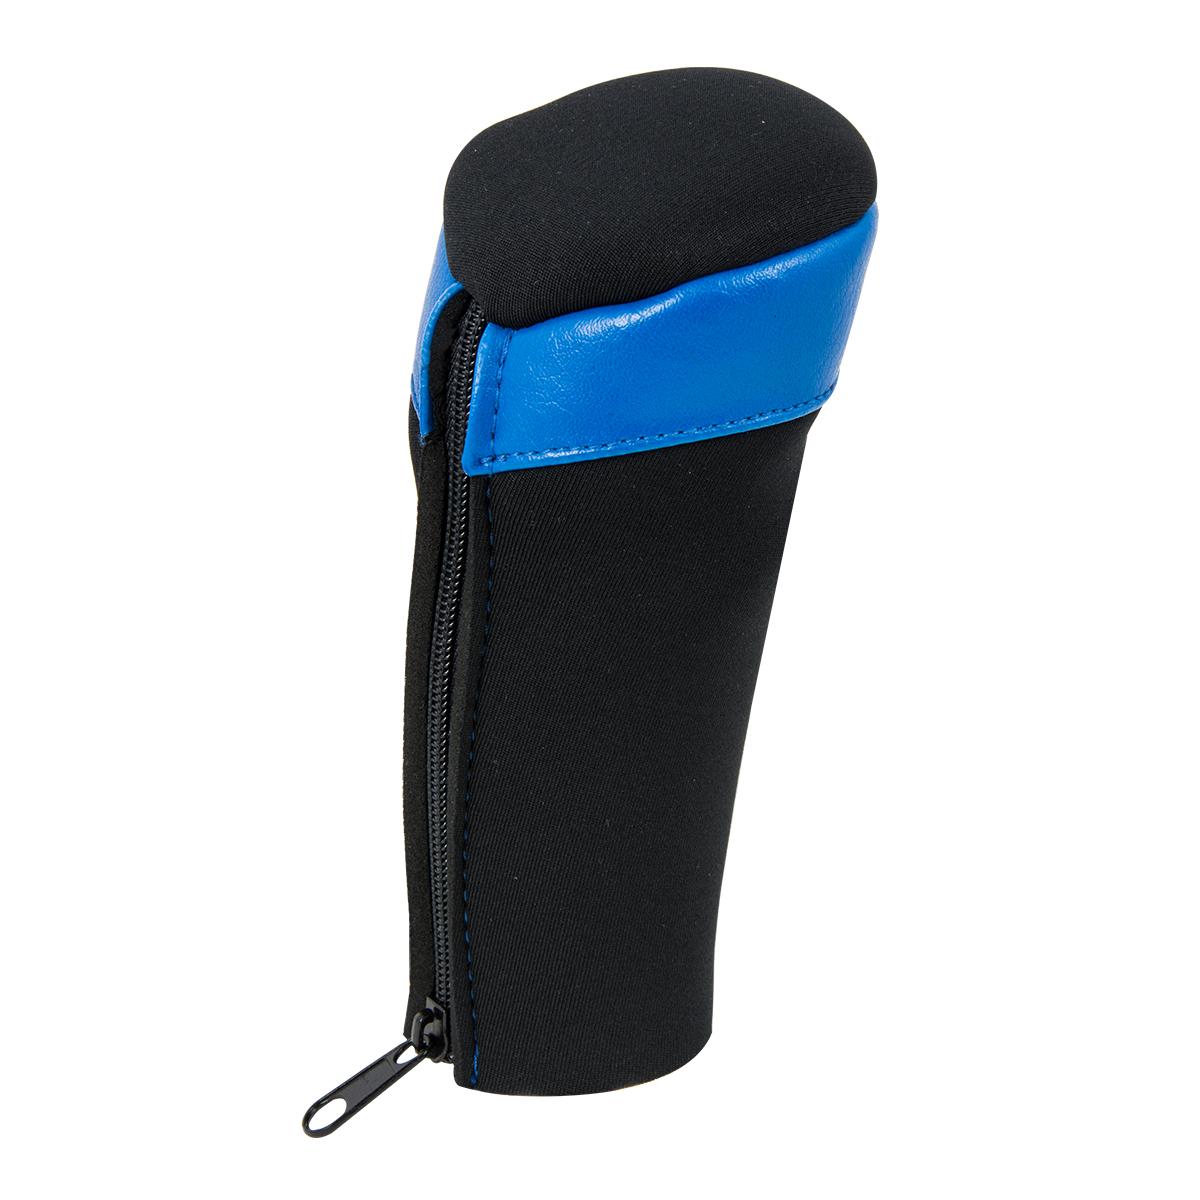 99871 Neoprene Black Gear Shift Knob Cover with Matte Blue Trim